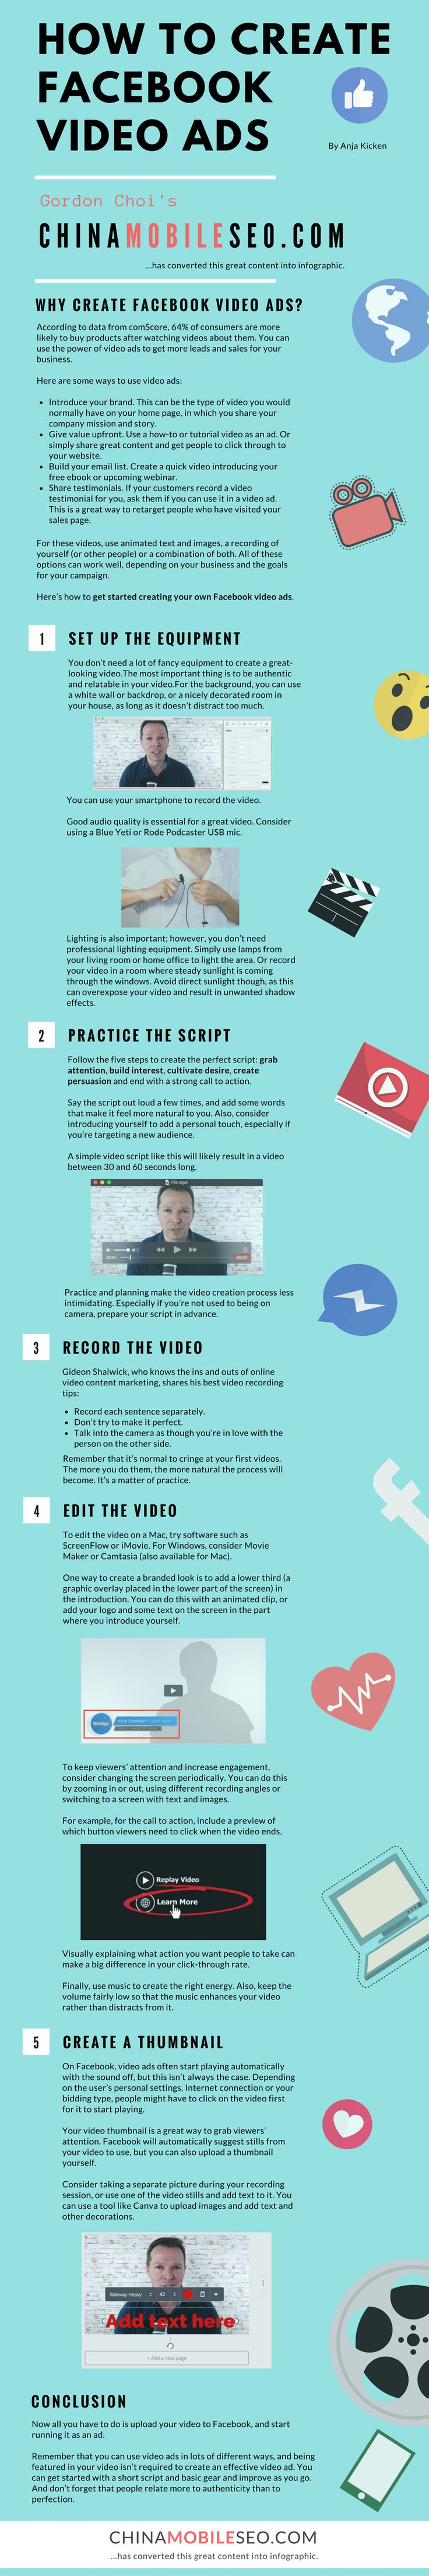 Facebook video ads | create a video | create videos | make a video | make videos | record a video |  ScreenFlow | iMovie | Camtasia | Movie Maker | video thumbnail | Blue Yeti | Social Media Examiner | SocialMediaExaminer.com | Anja Kicken | Gordon Choi | ChinaMobileSEO.com